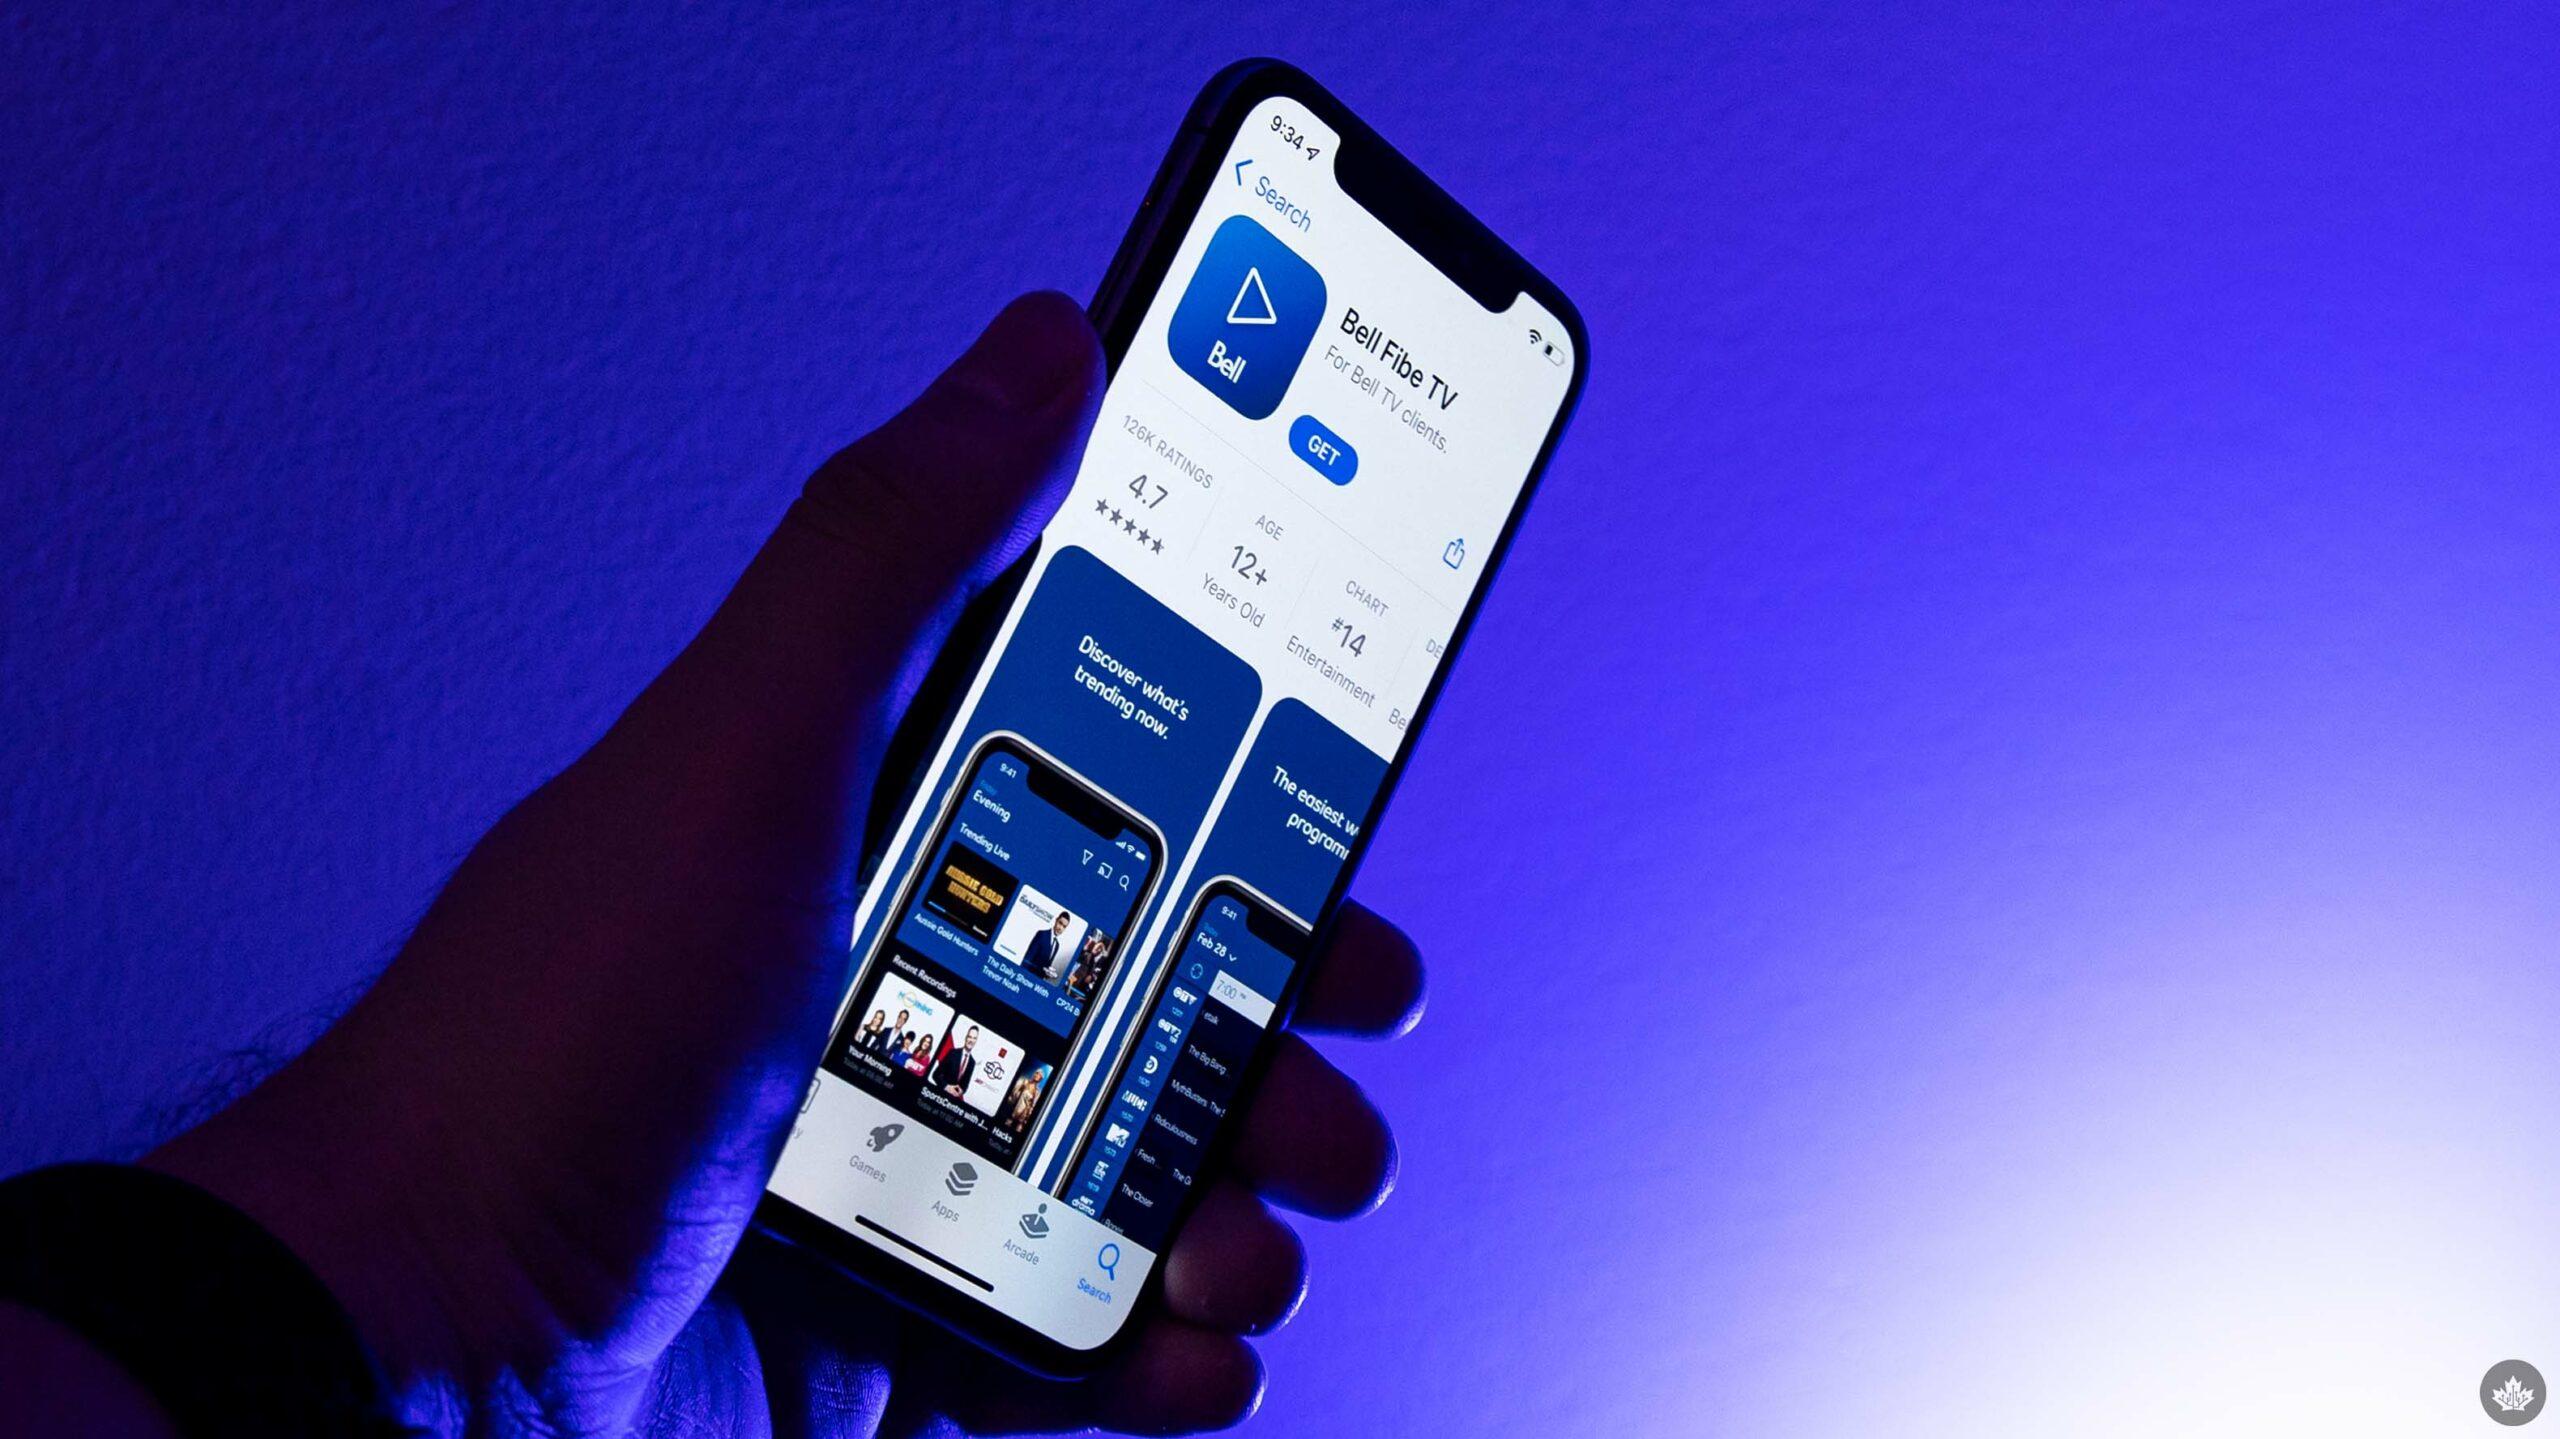 Bell improves rewind, fast-forward controls in Fibe TV iOS app thumbnail